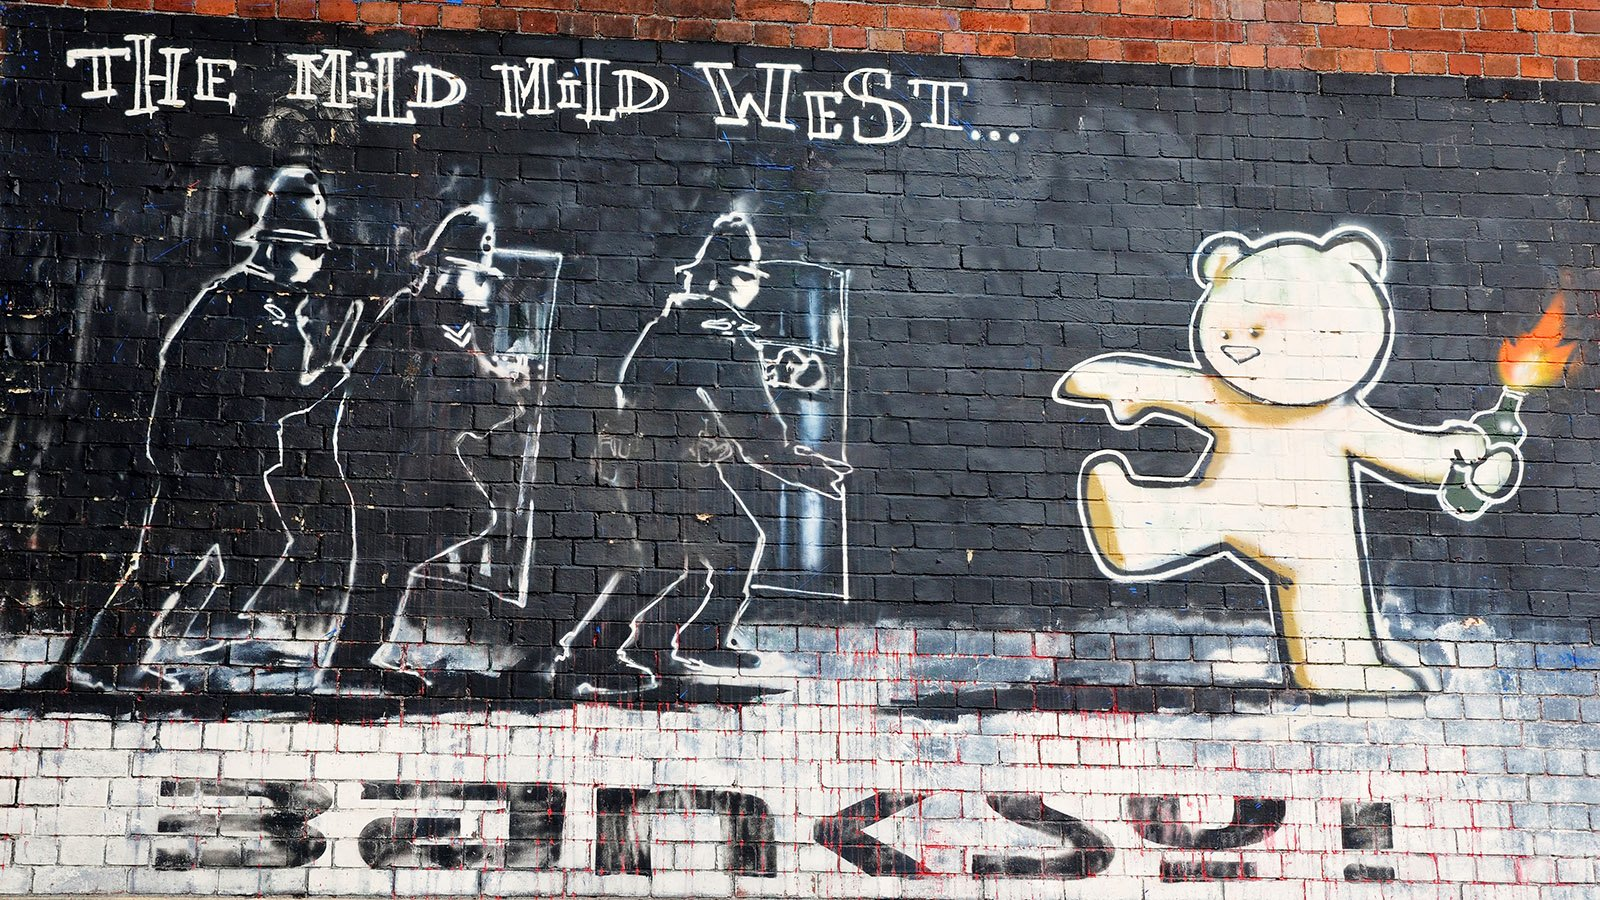 Guide to Finding Banksy in Bristol - Mild Mild West (Teddy bear v Police)